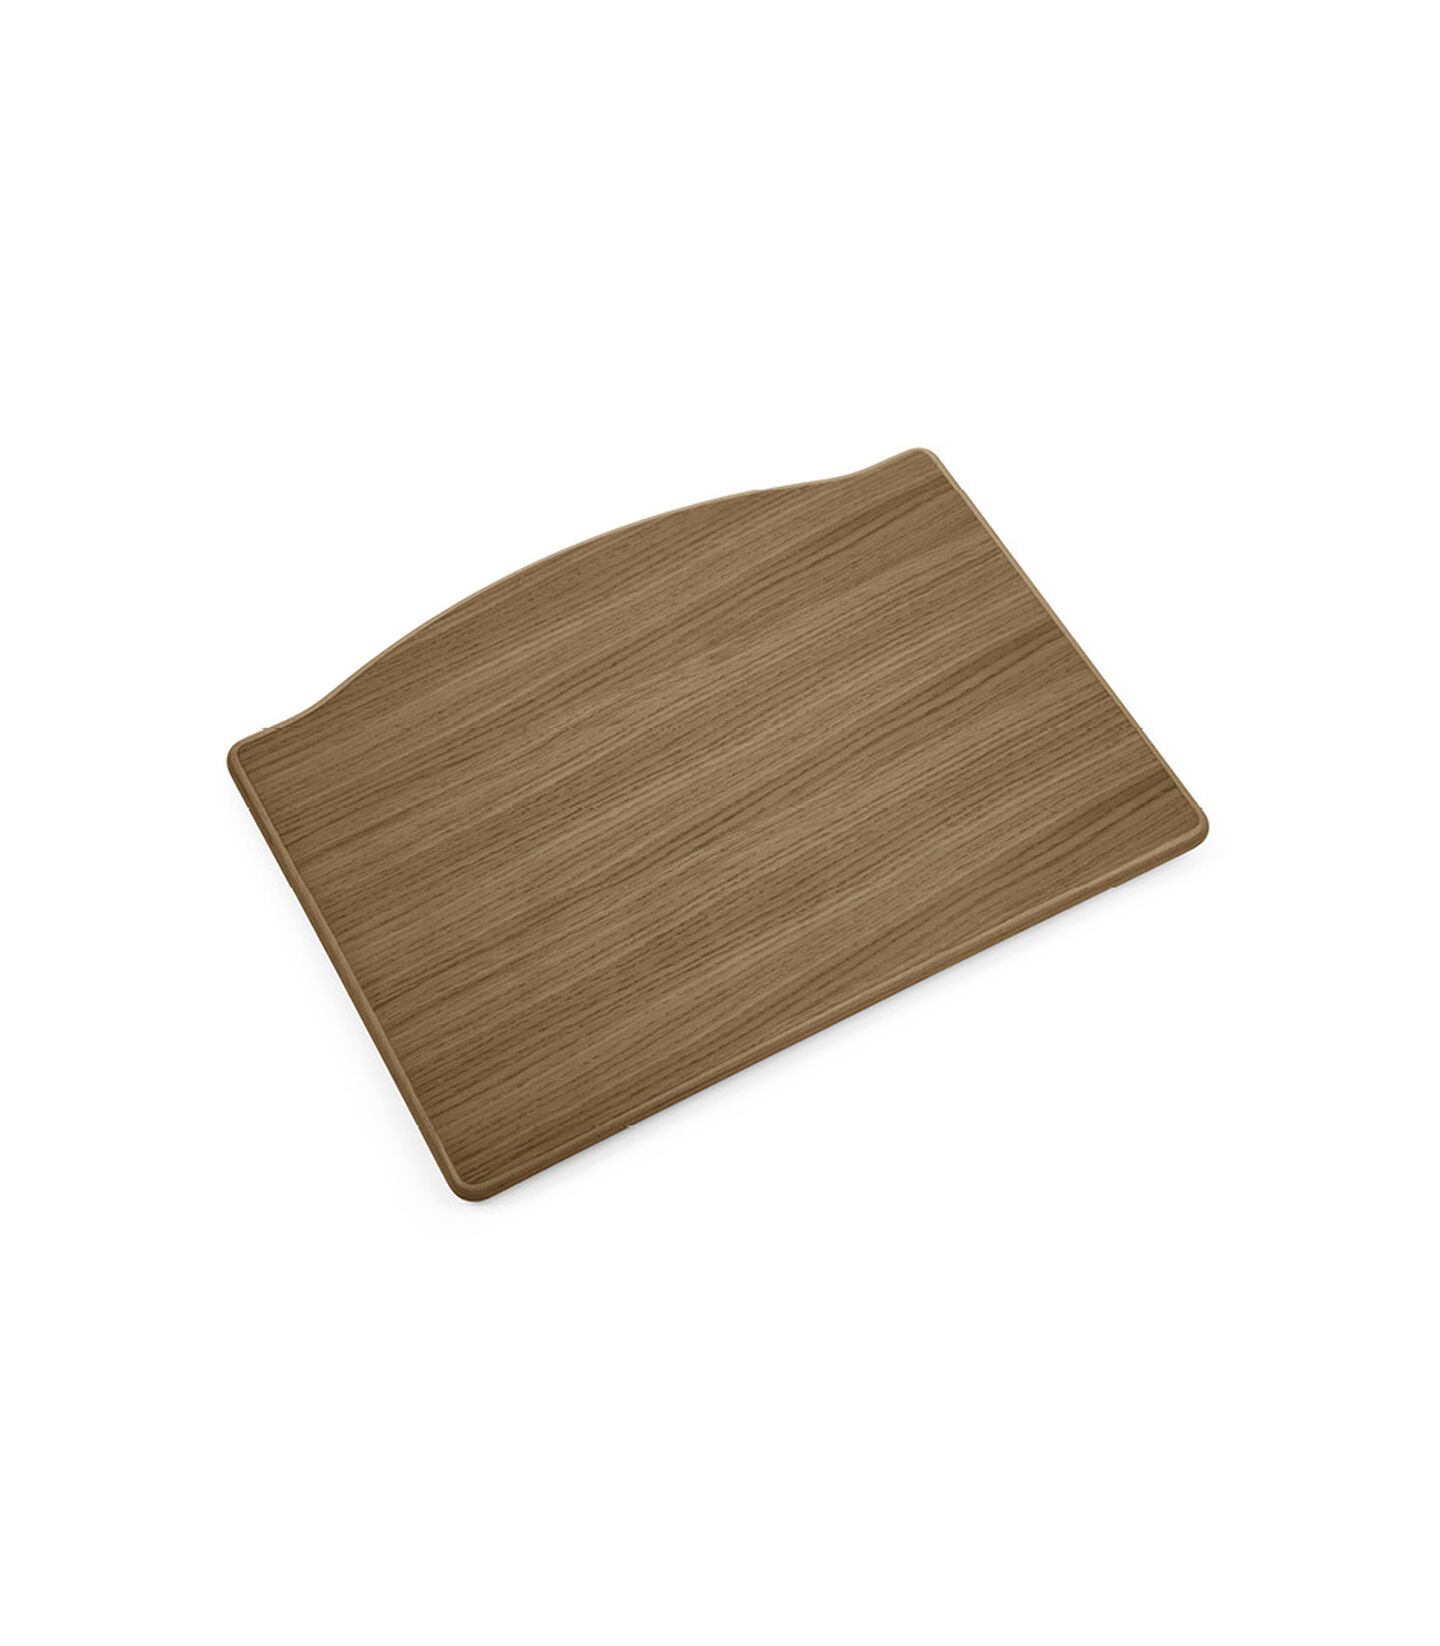 Tripp Trapp® Footplate Oak Brown, Bruin eiken, mainview view 1